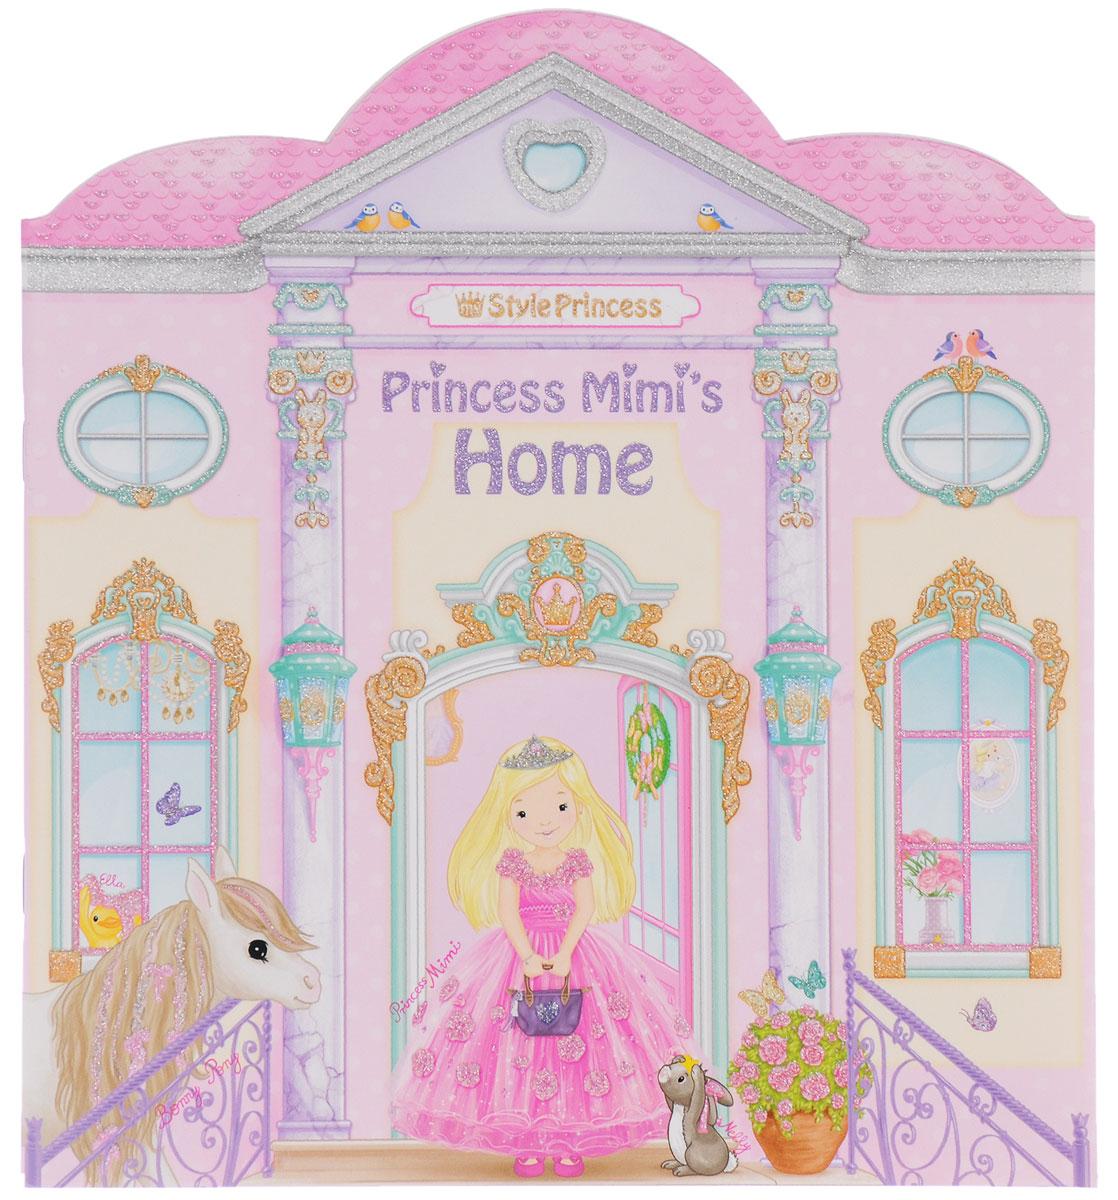 My Style Princess: Princess Mimi's Home / Дом принцессы Мими. Развивающий альбом с наклейками, Книжки с наклейками  - купить со скидкой